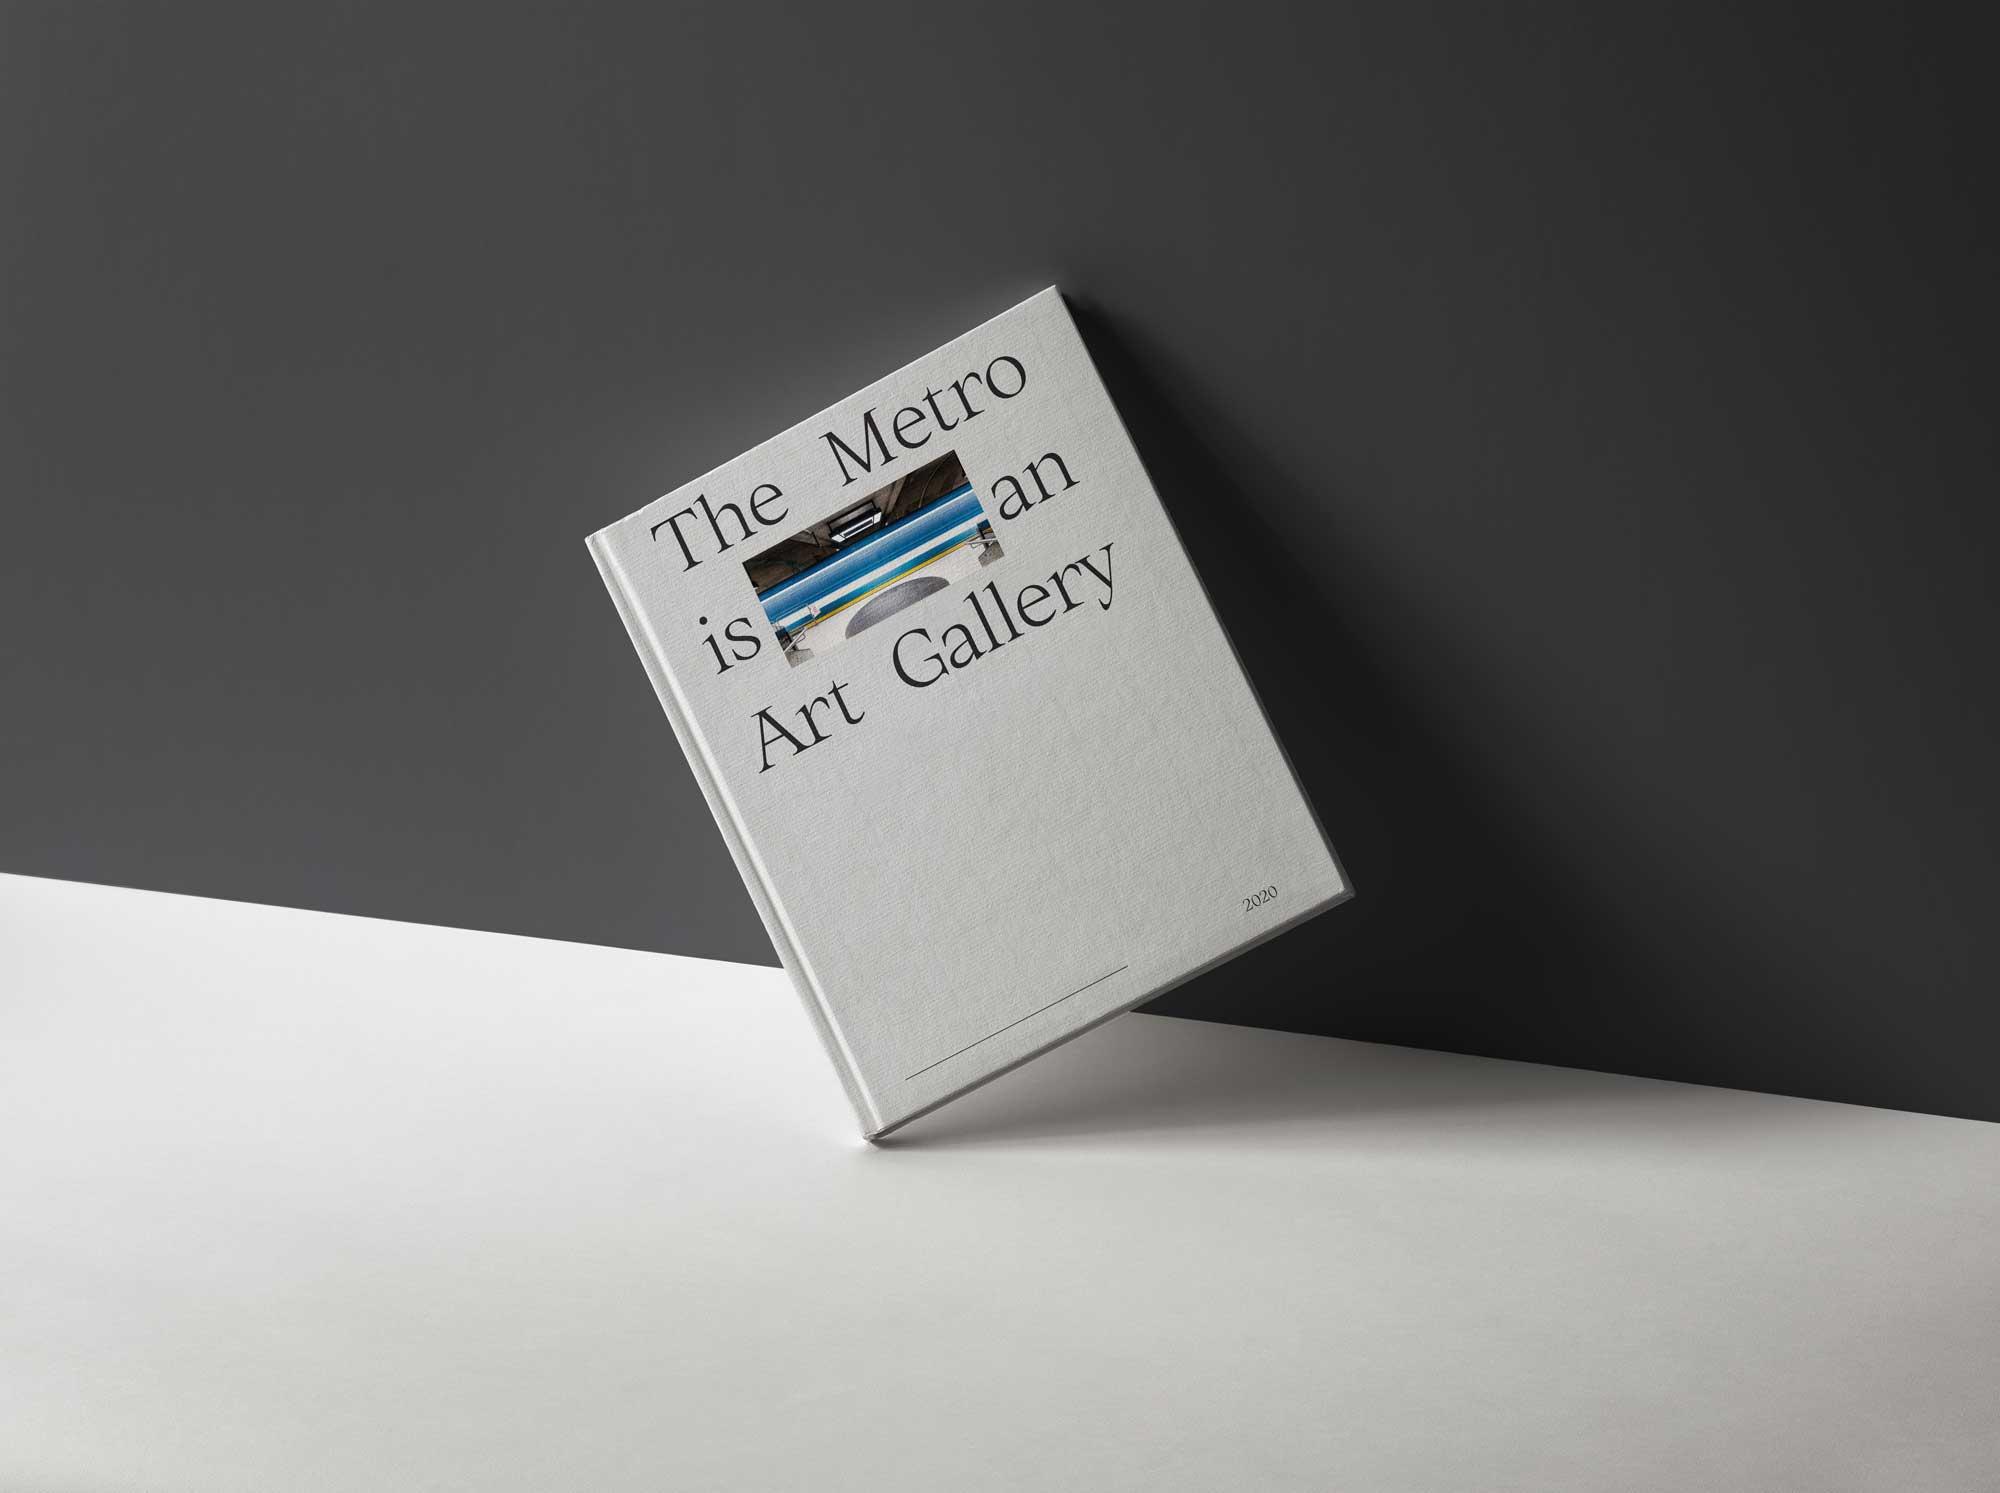 grey book against wall